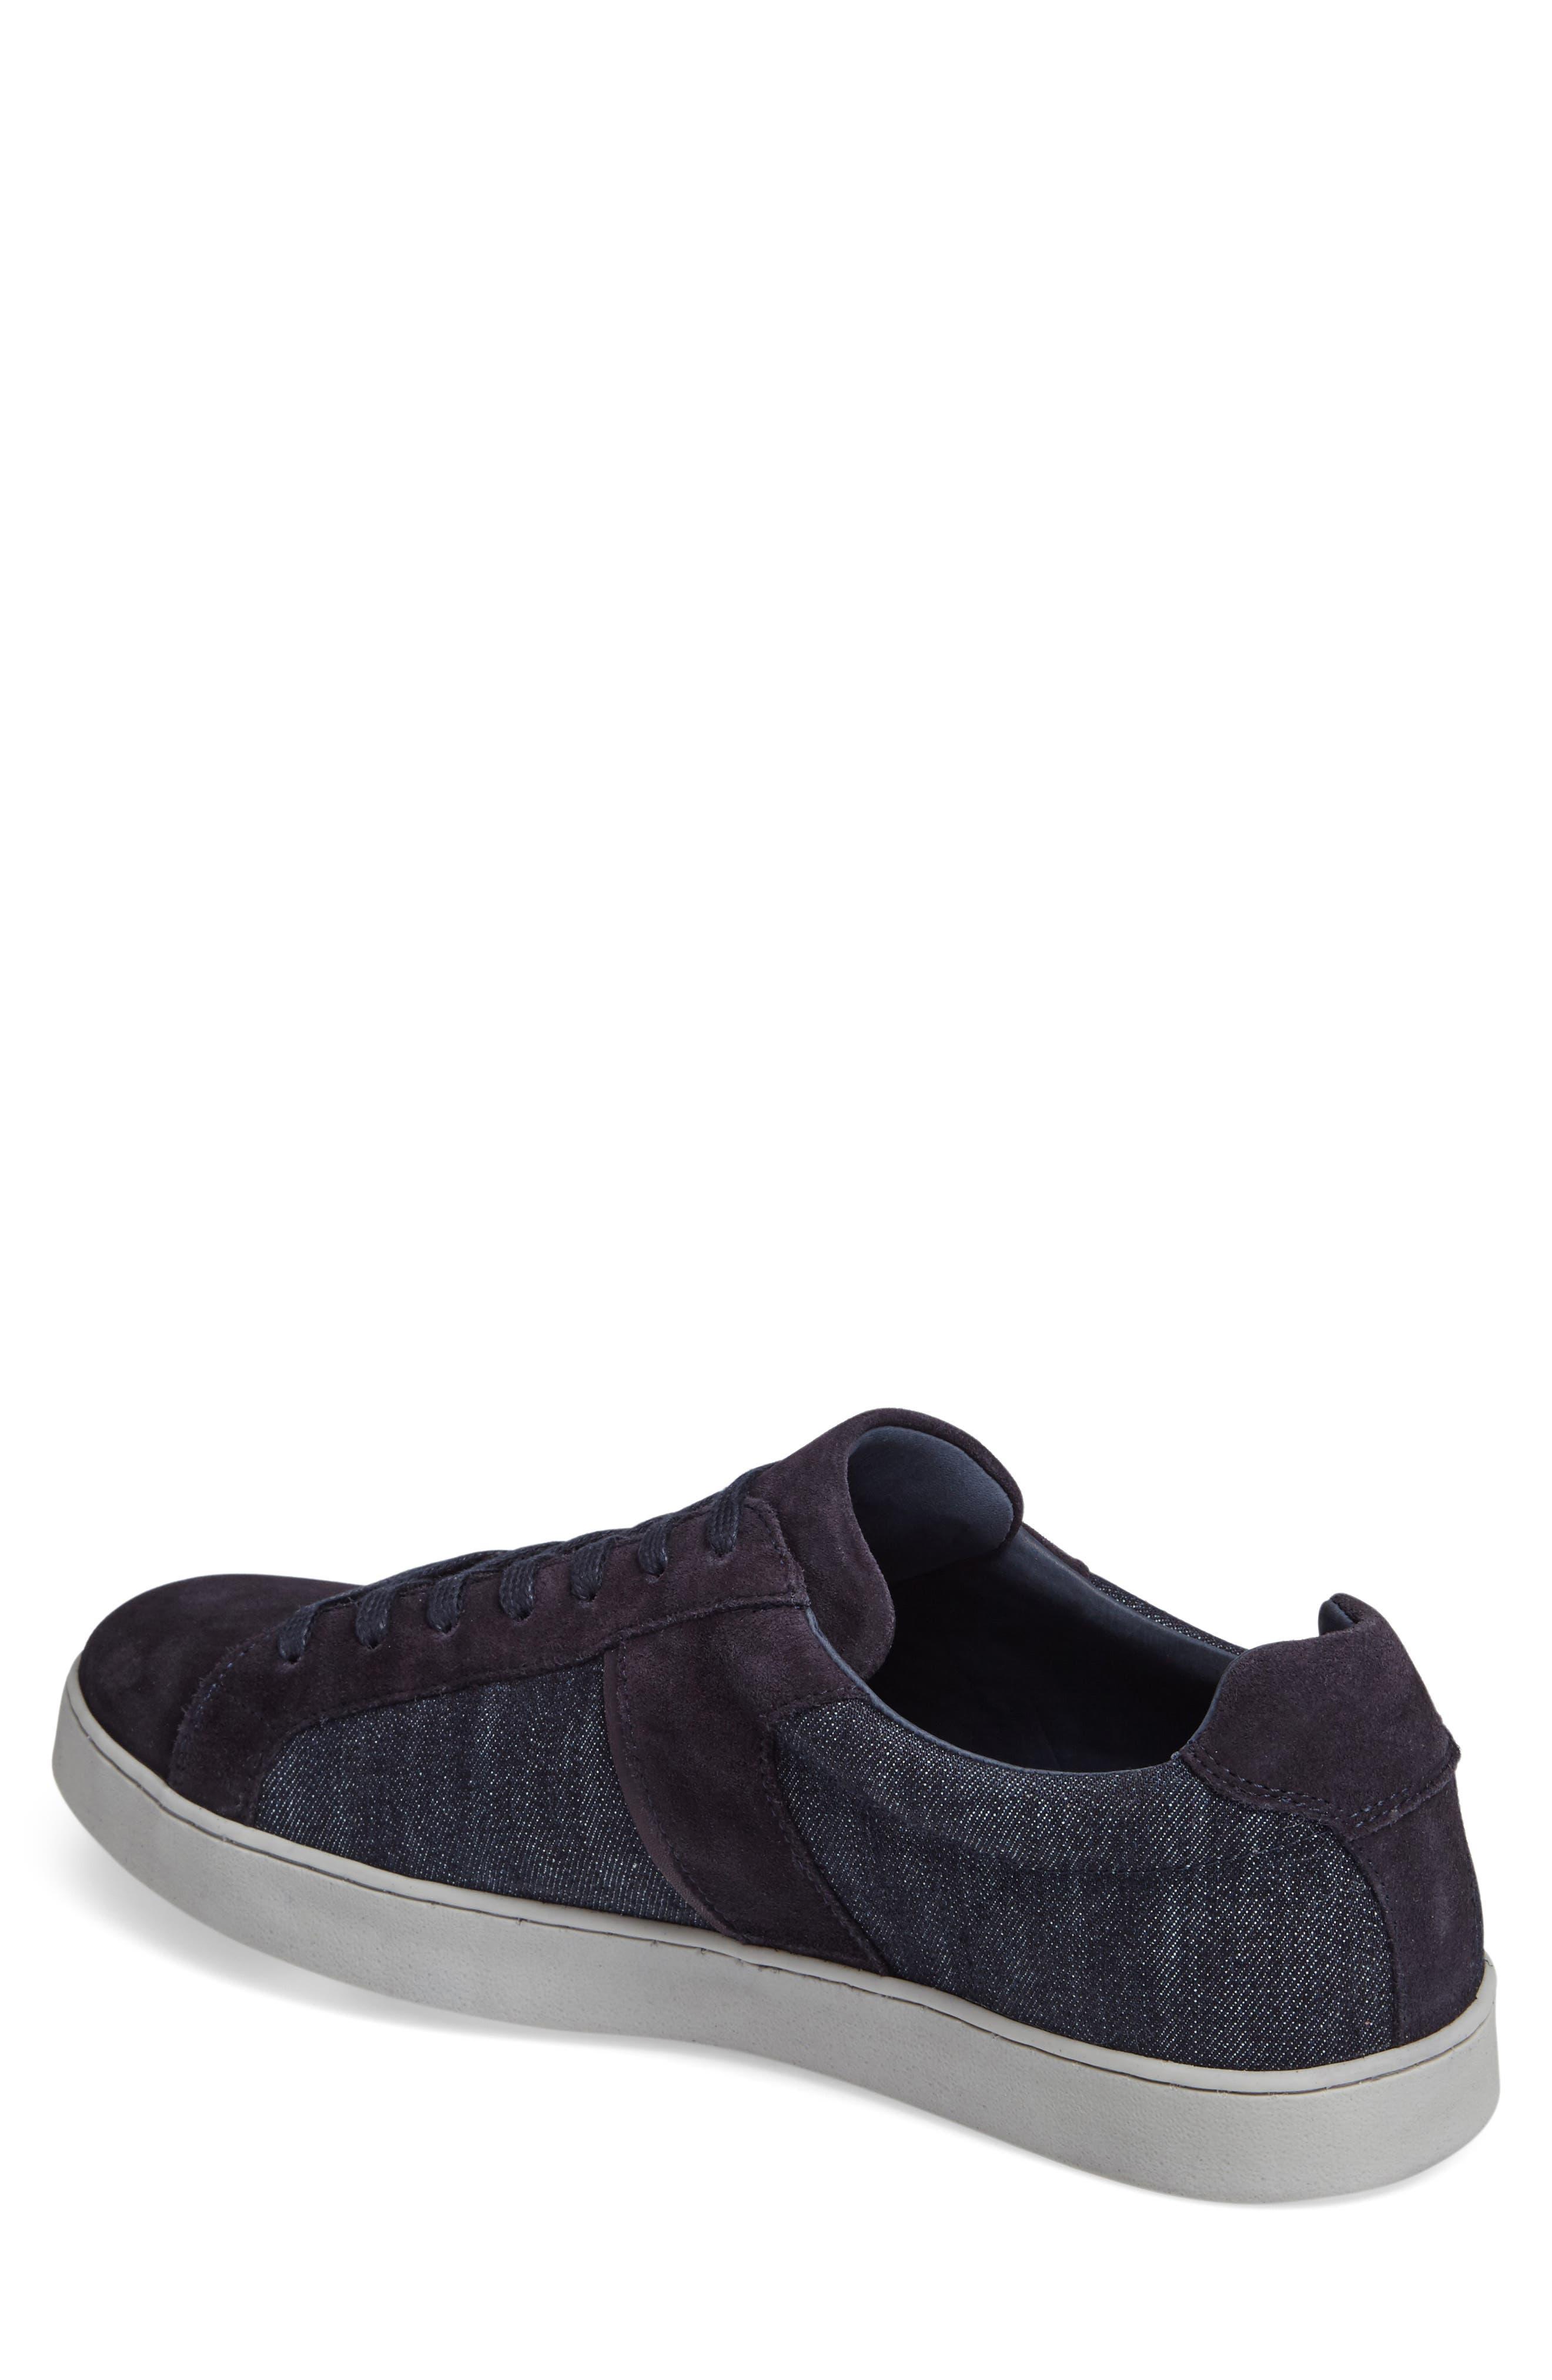 Ginx Sneaker,                             Alternate thumbnail 2, color,                             Marino Suede